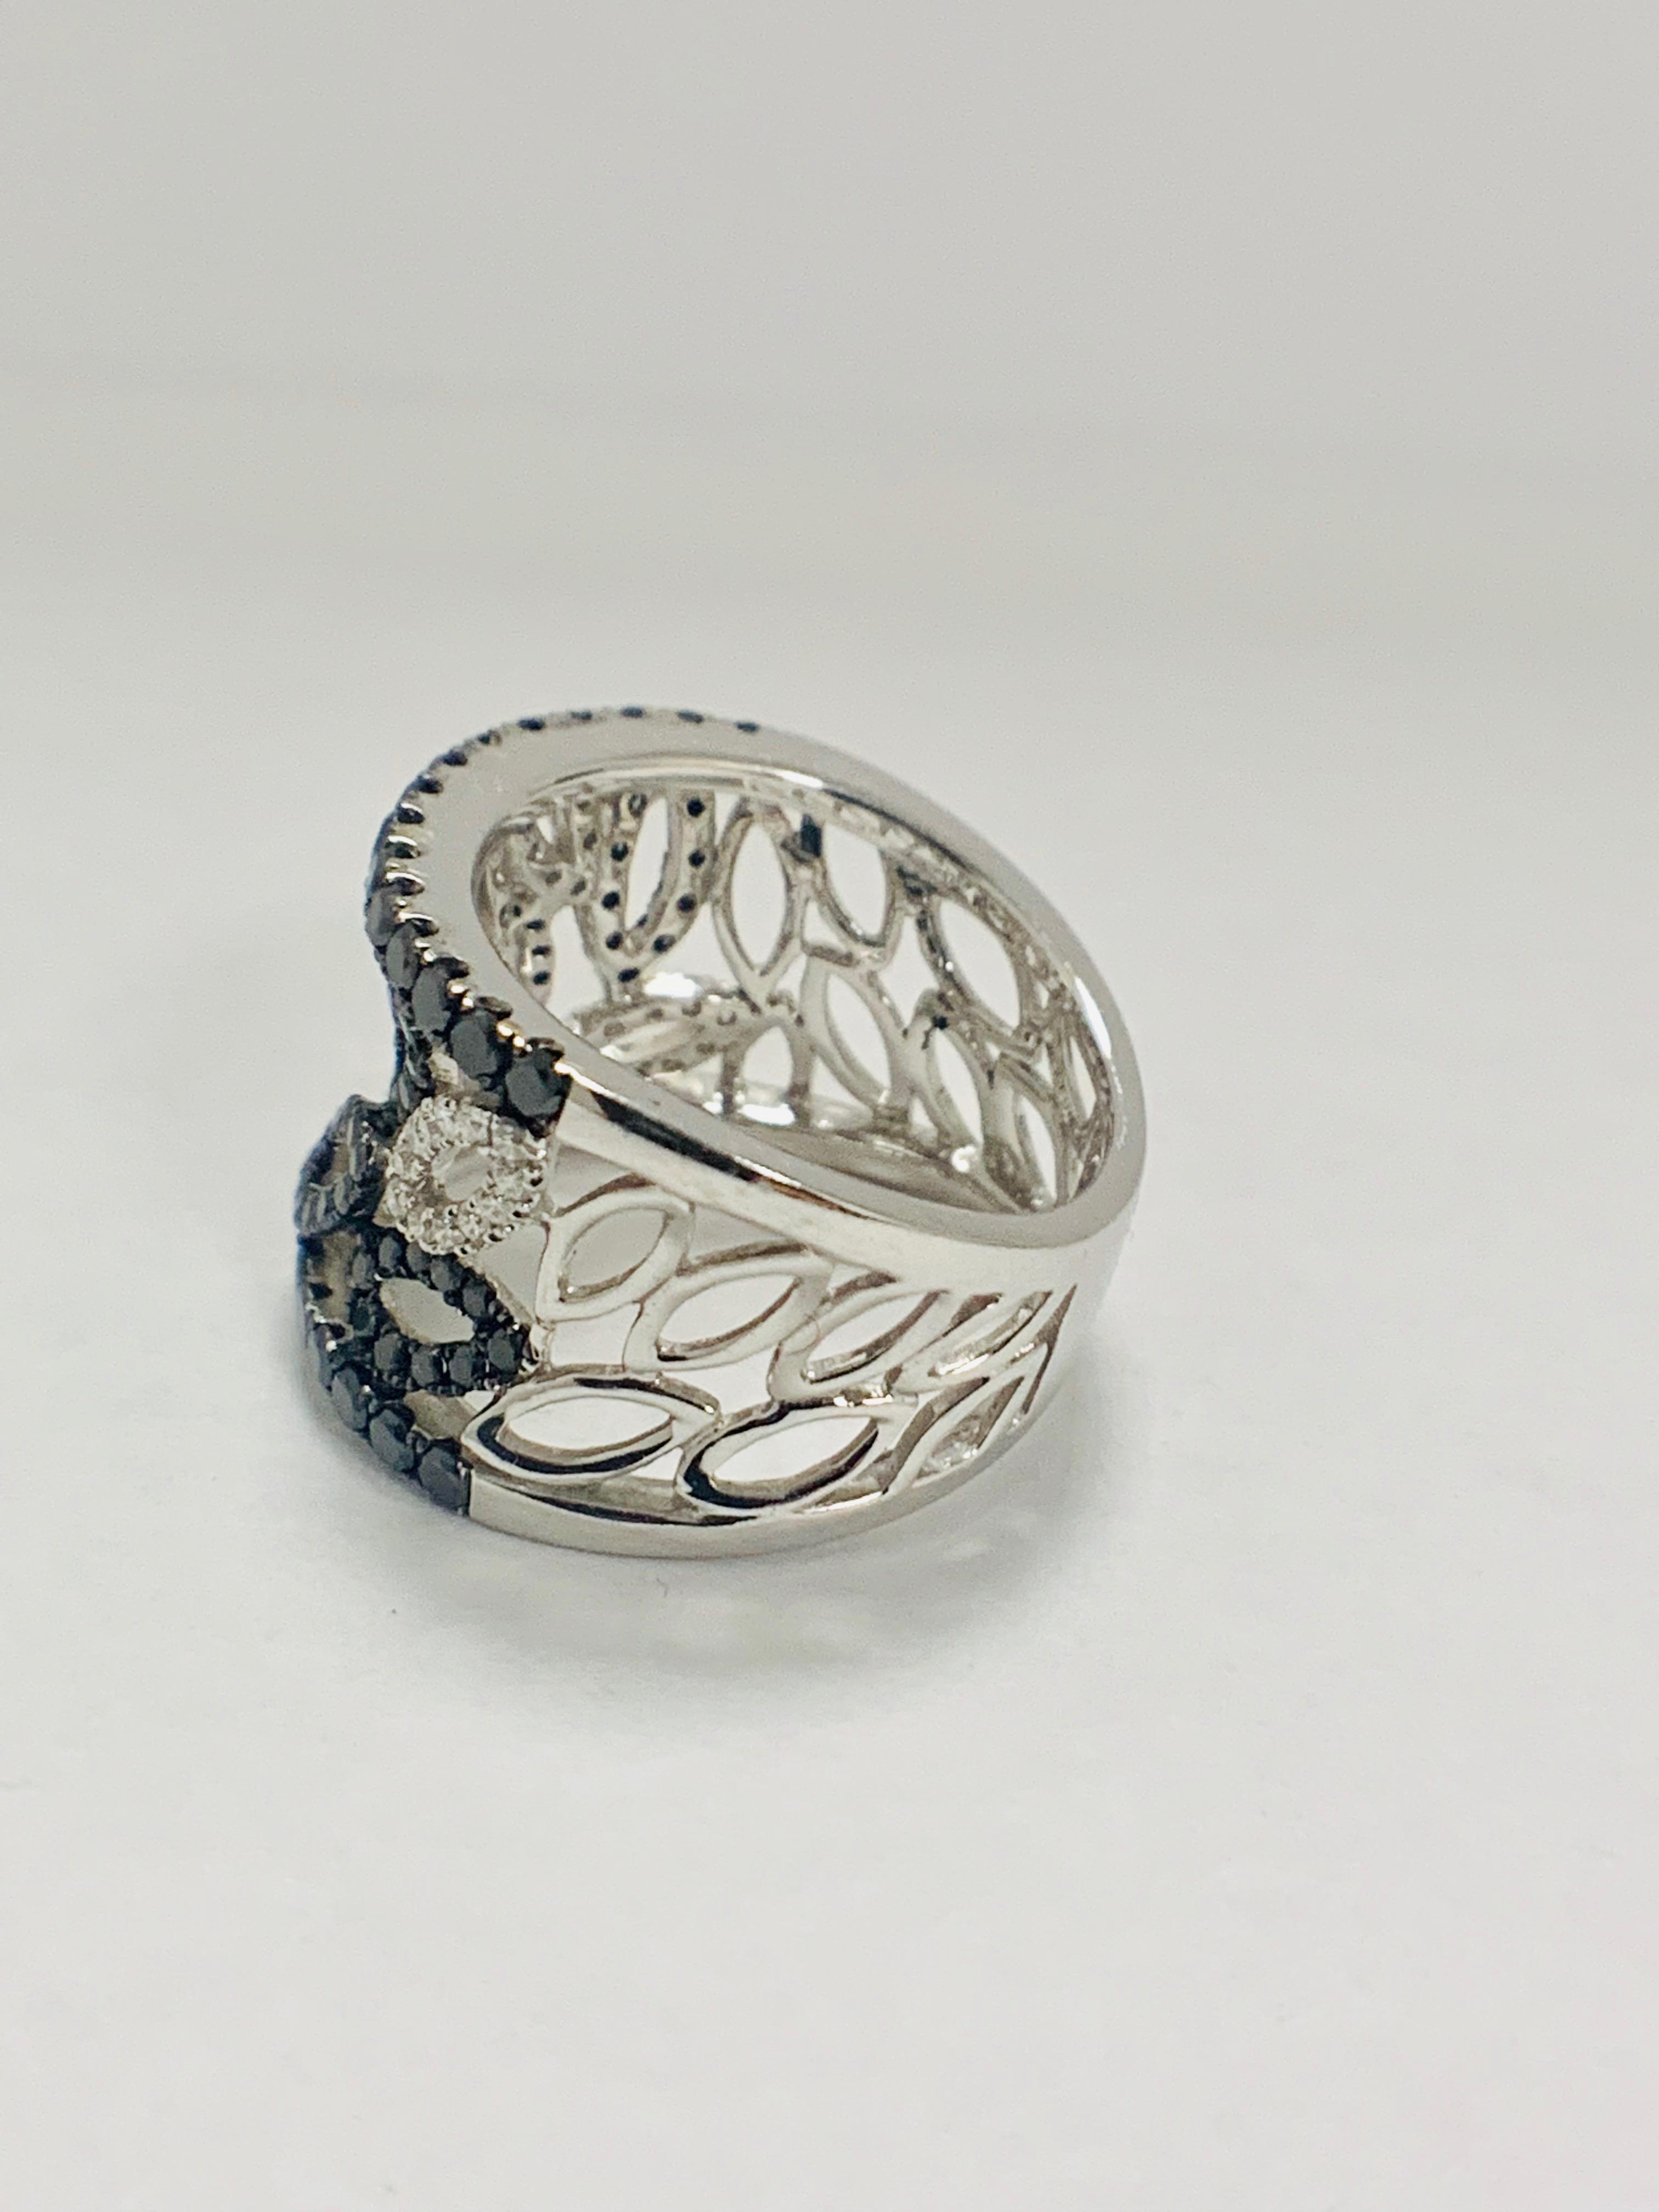 18ct White Gold Diamond ring featuring 90 round cut, black Diamonds (1.14ct TBDW) - Image 7 of 15